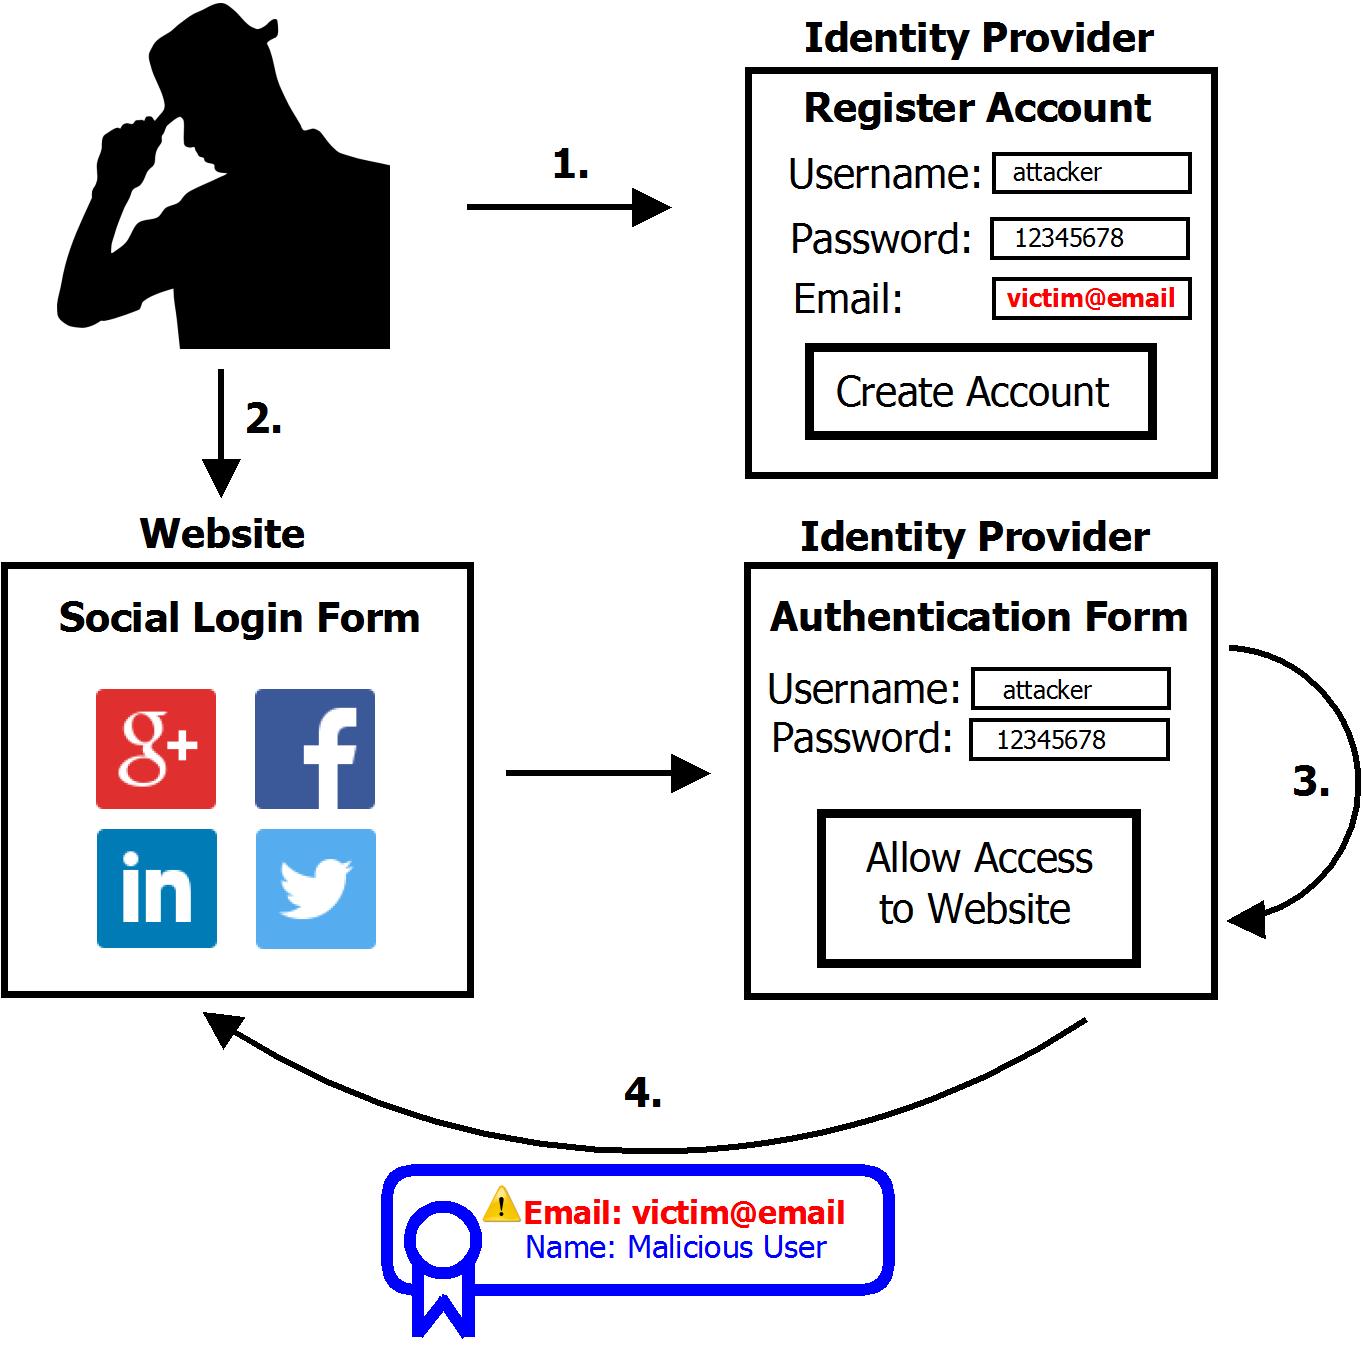 SpoofedMe' attacks exploited LinkedIn, Amazon social login